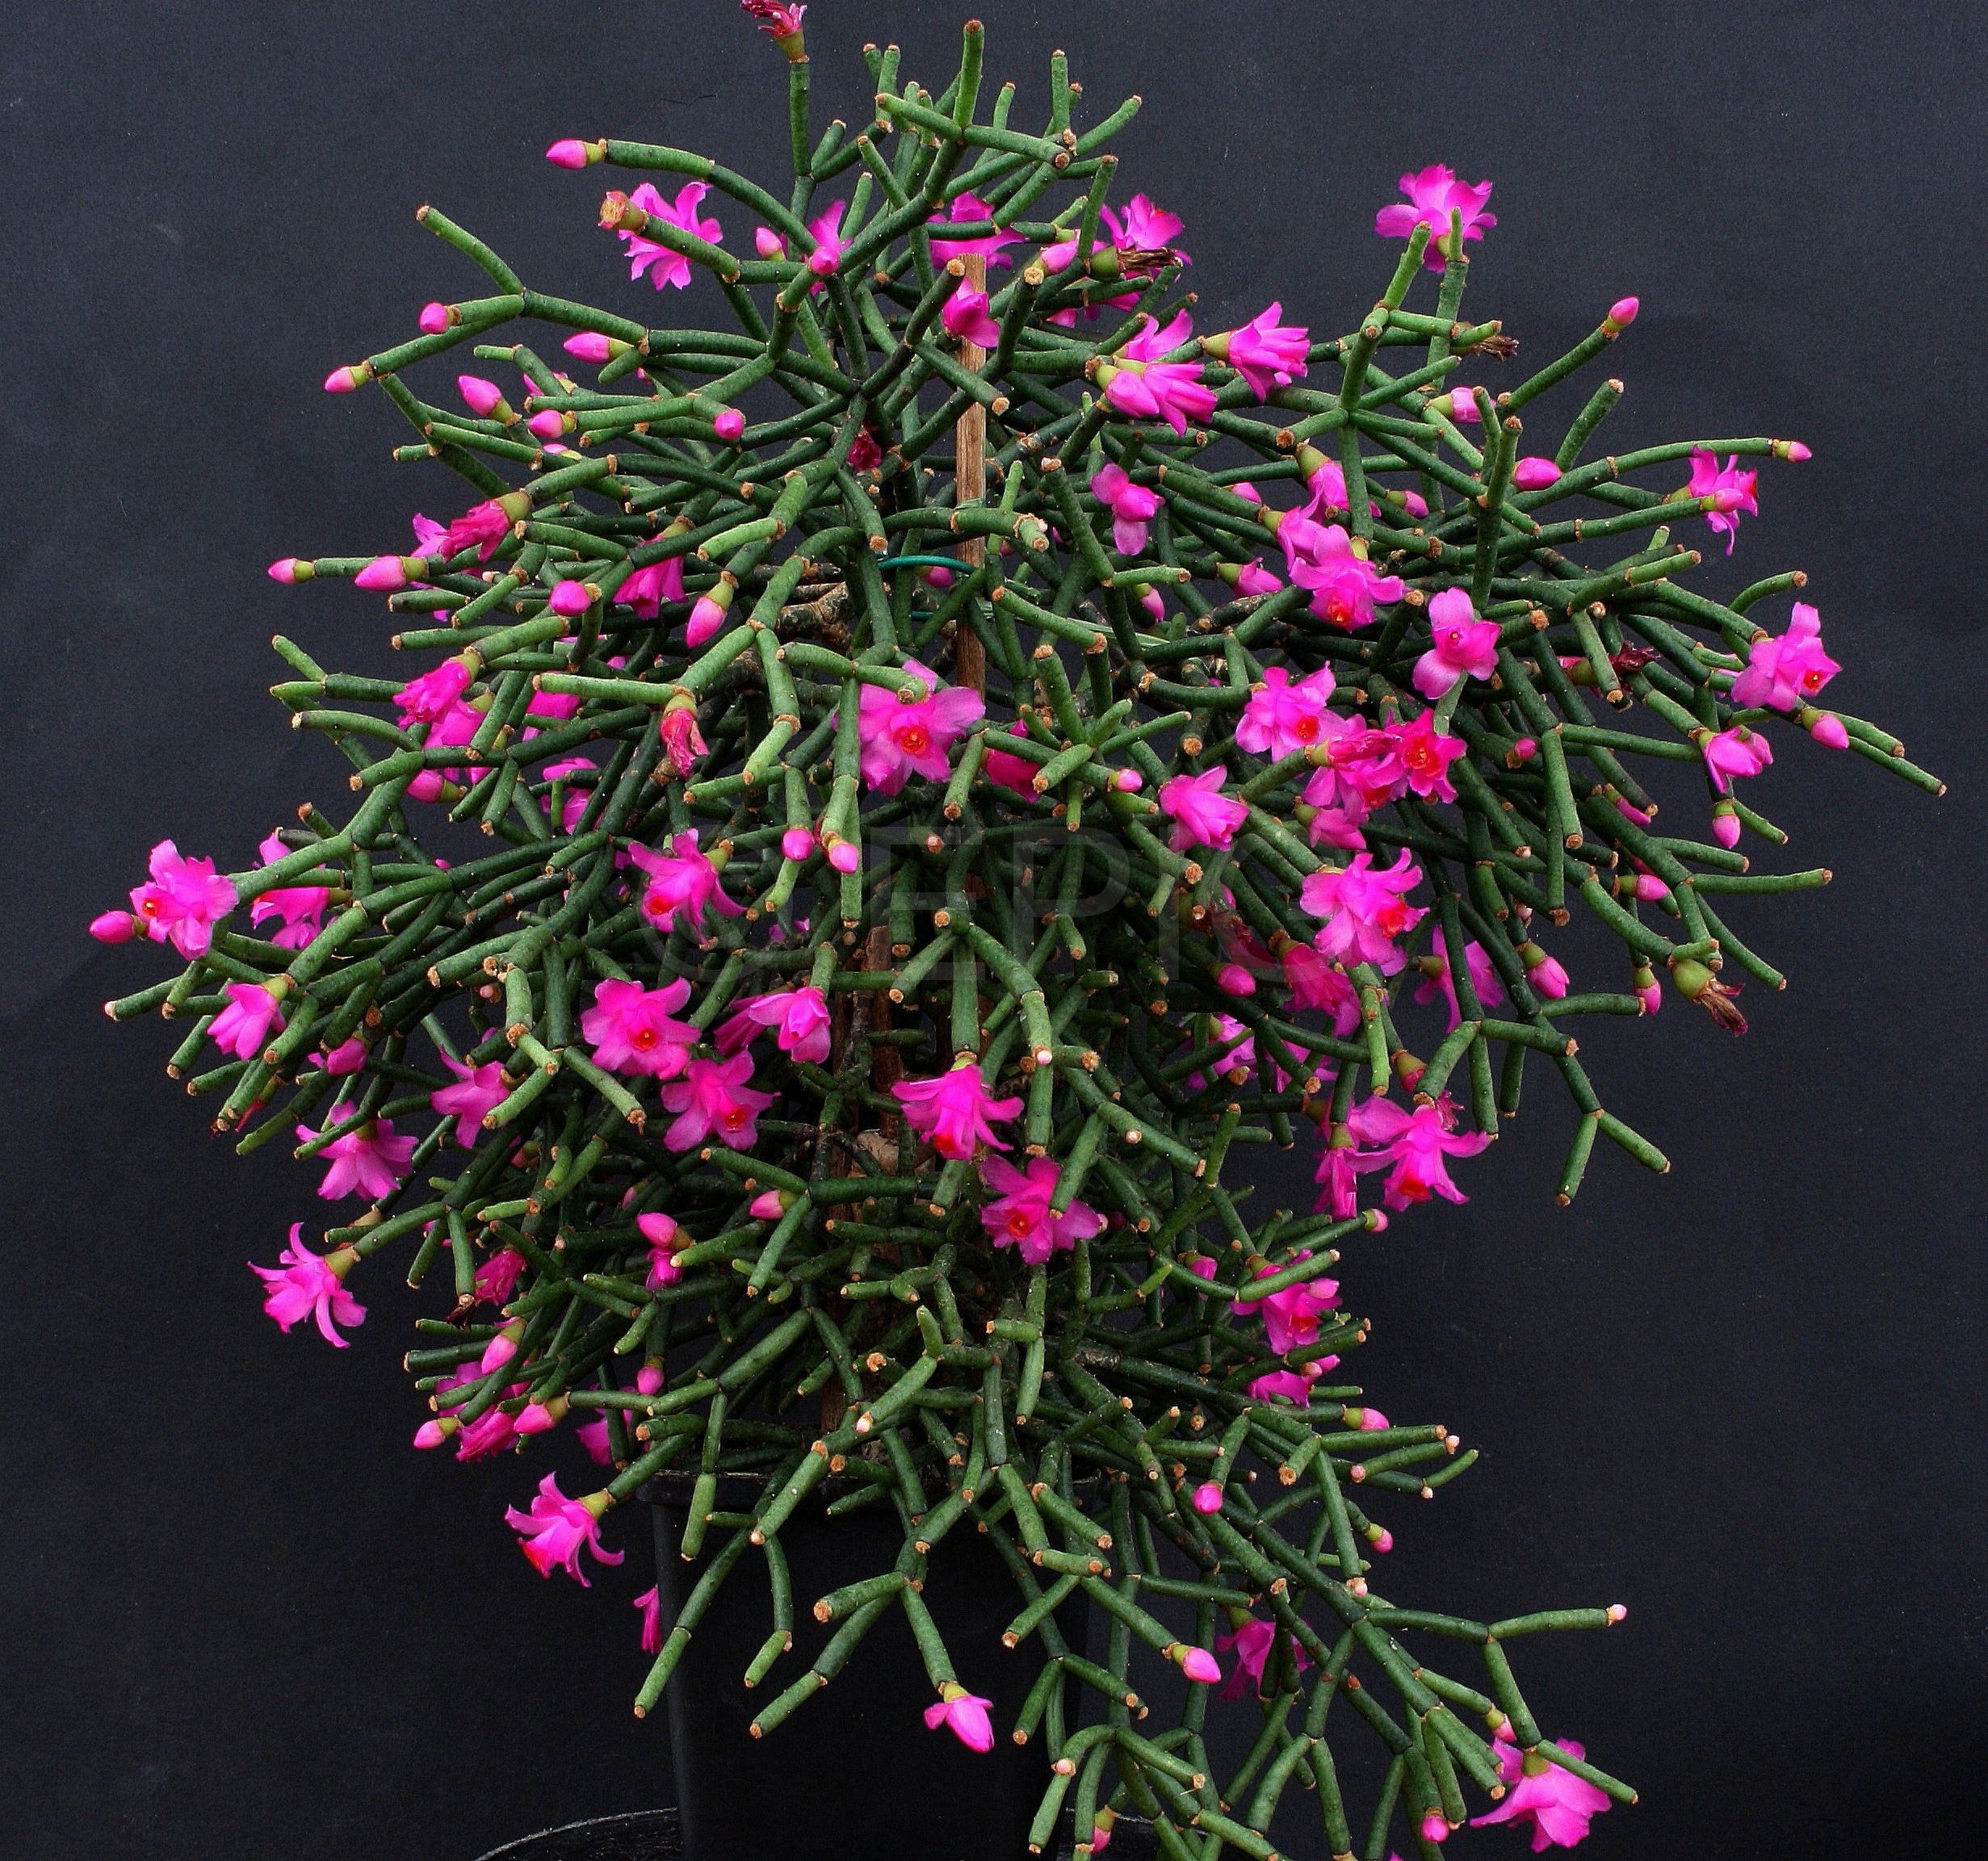 Hatiora herminiae AH721 (Foto Jochen Bockemühl)